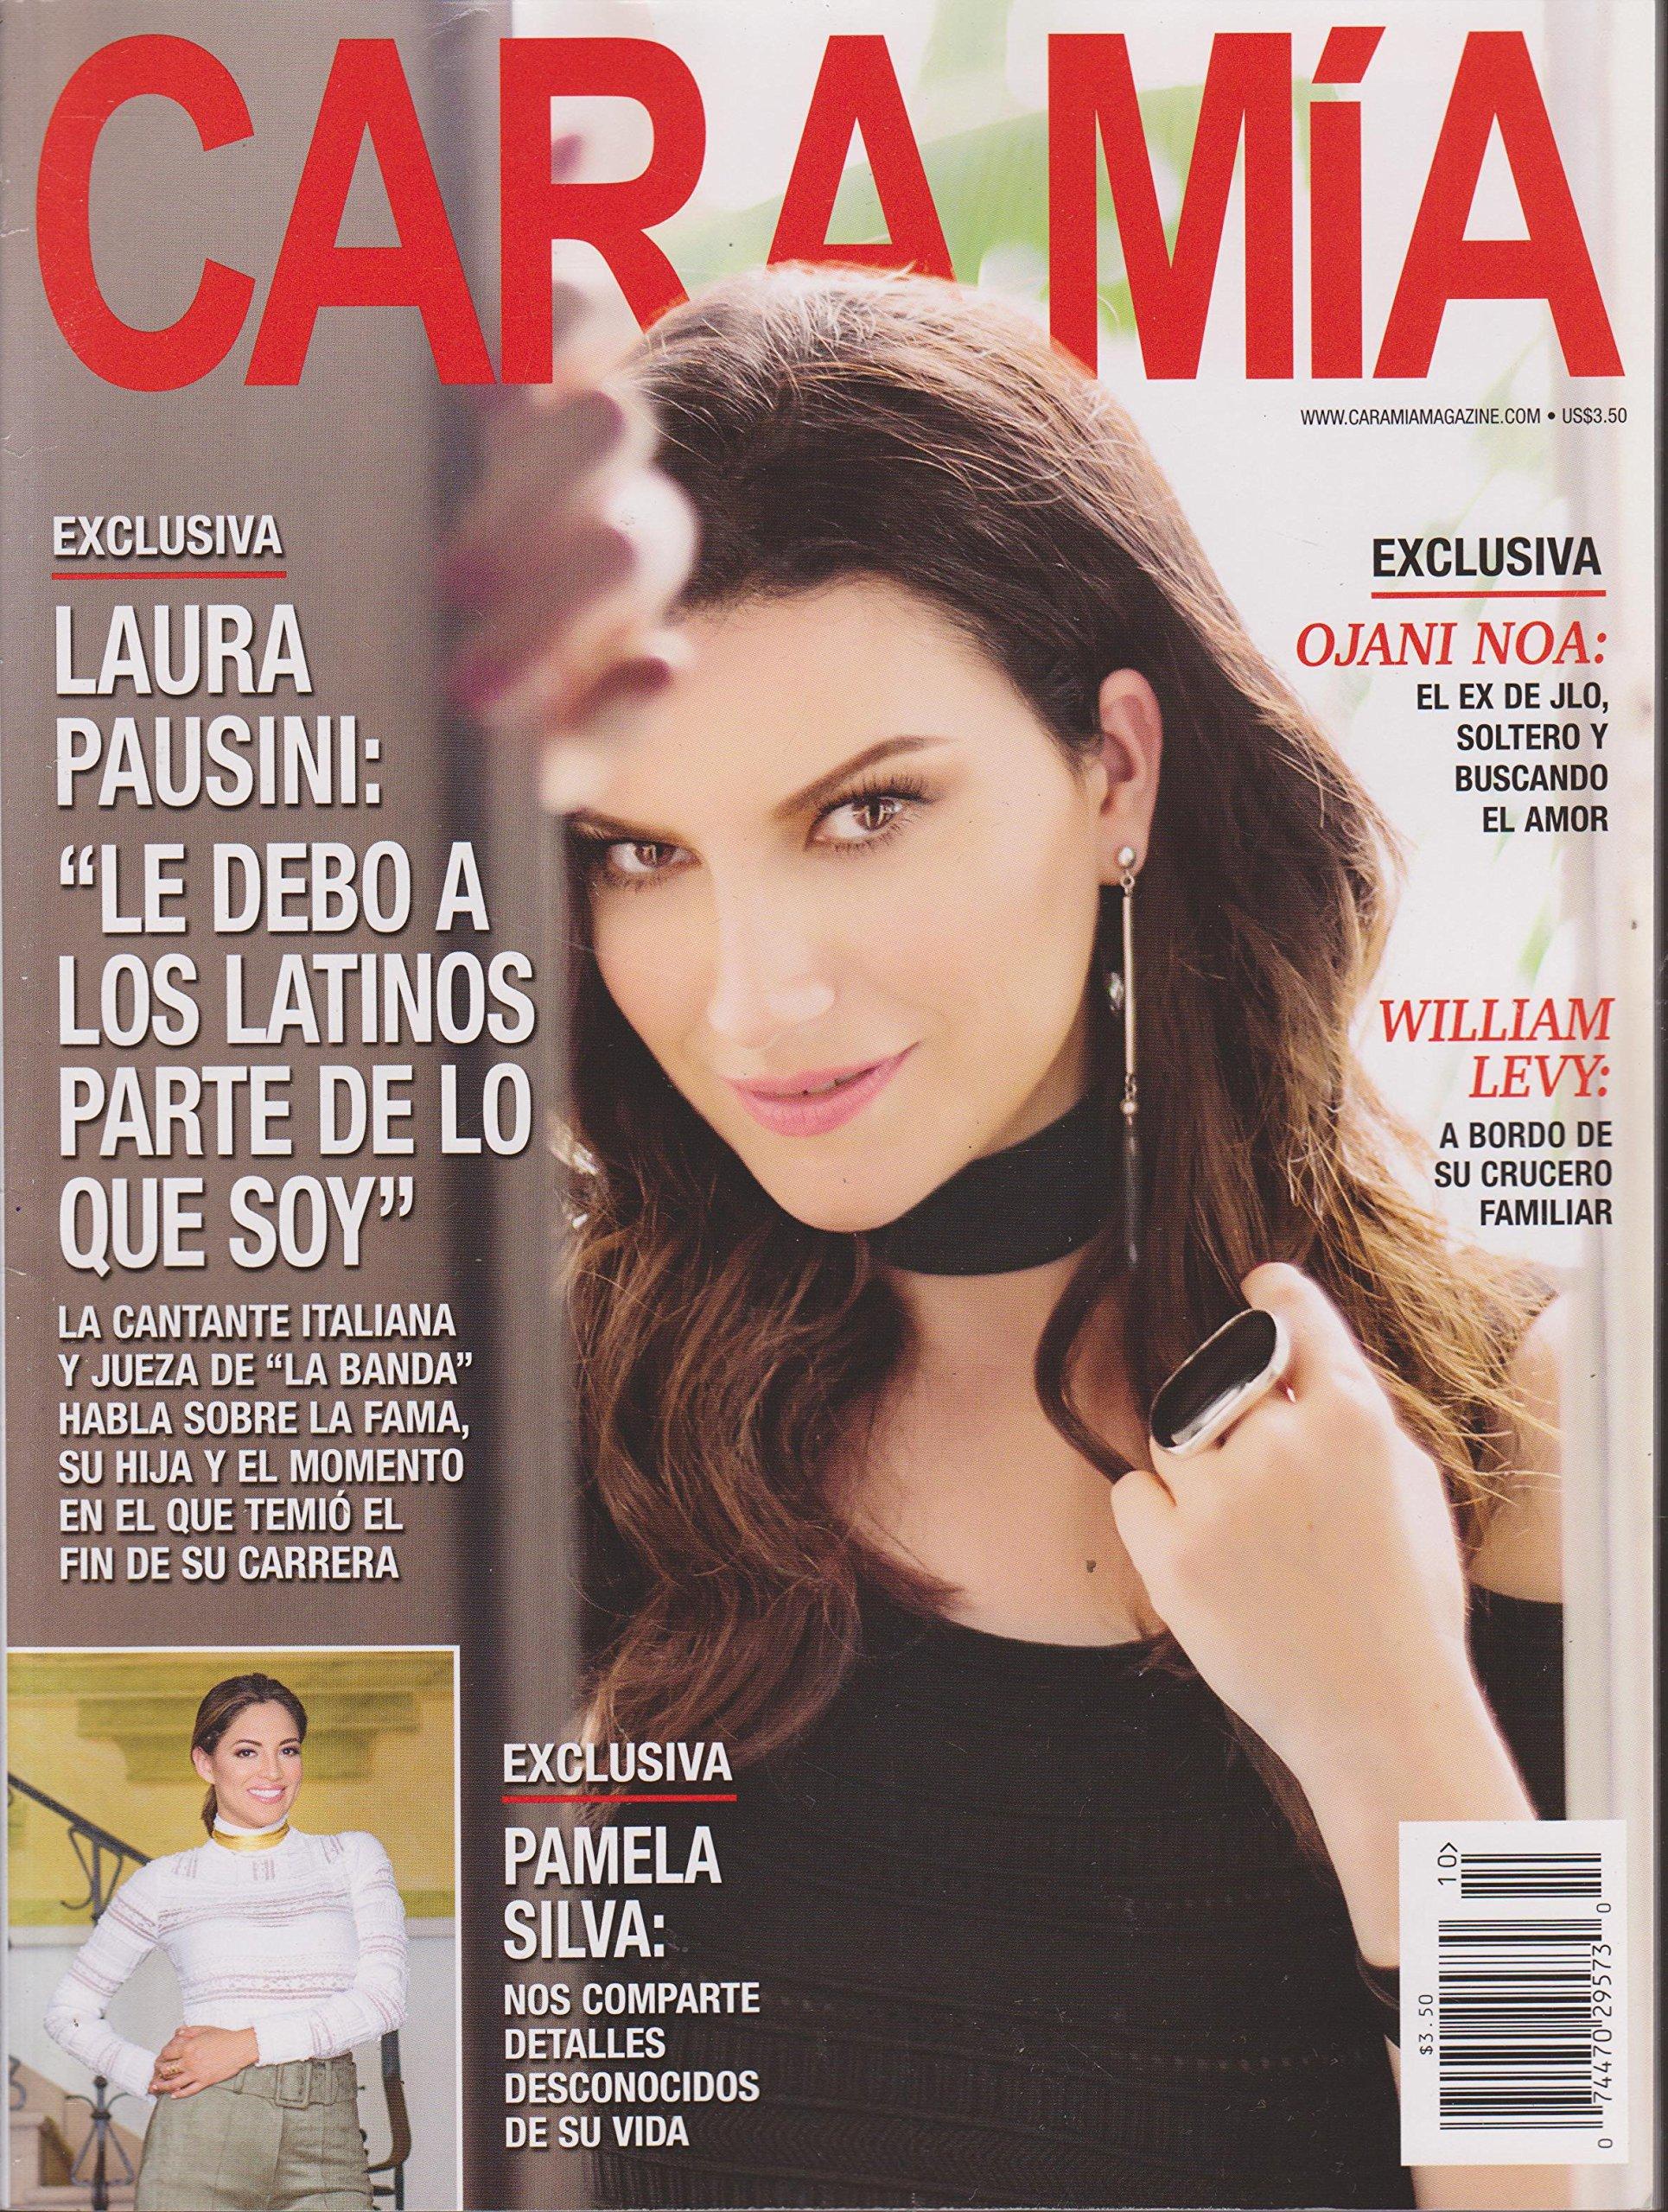 Cara Mia Magazine Septembre/Octubre 2016 ebook